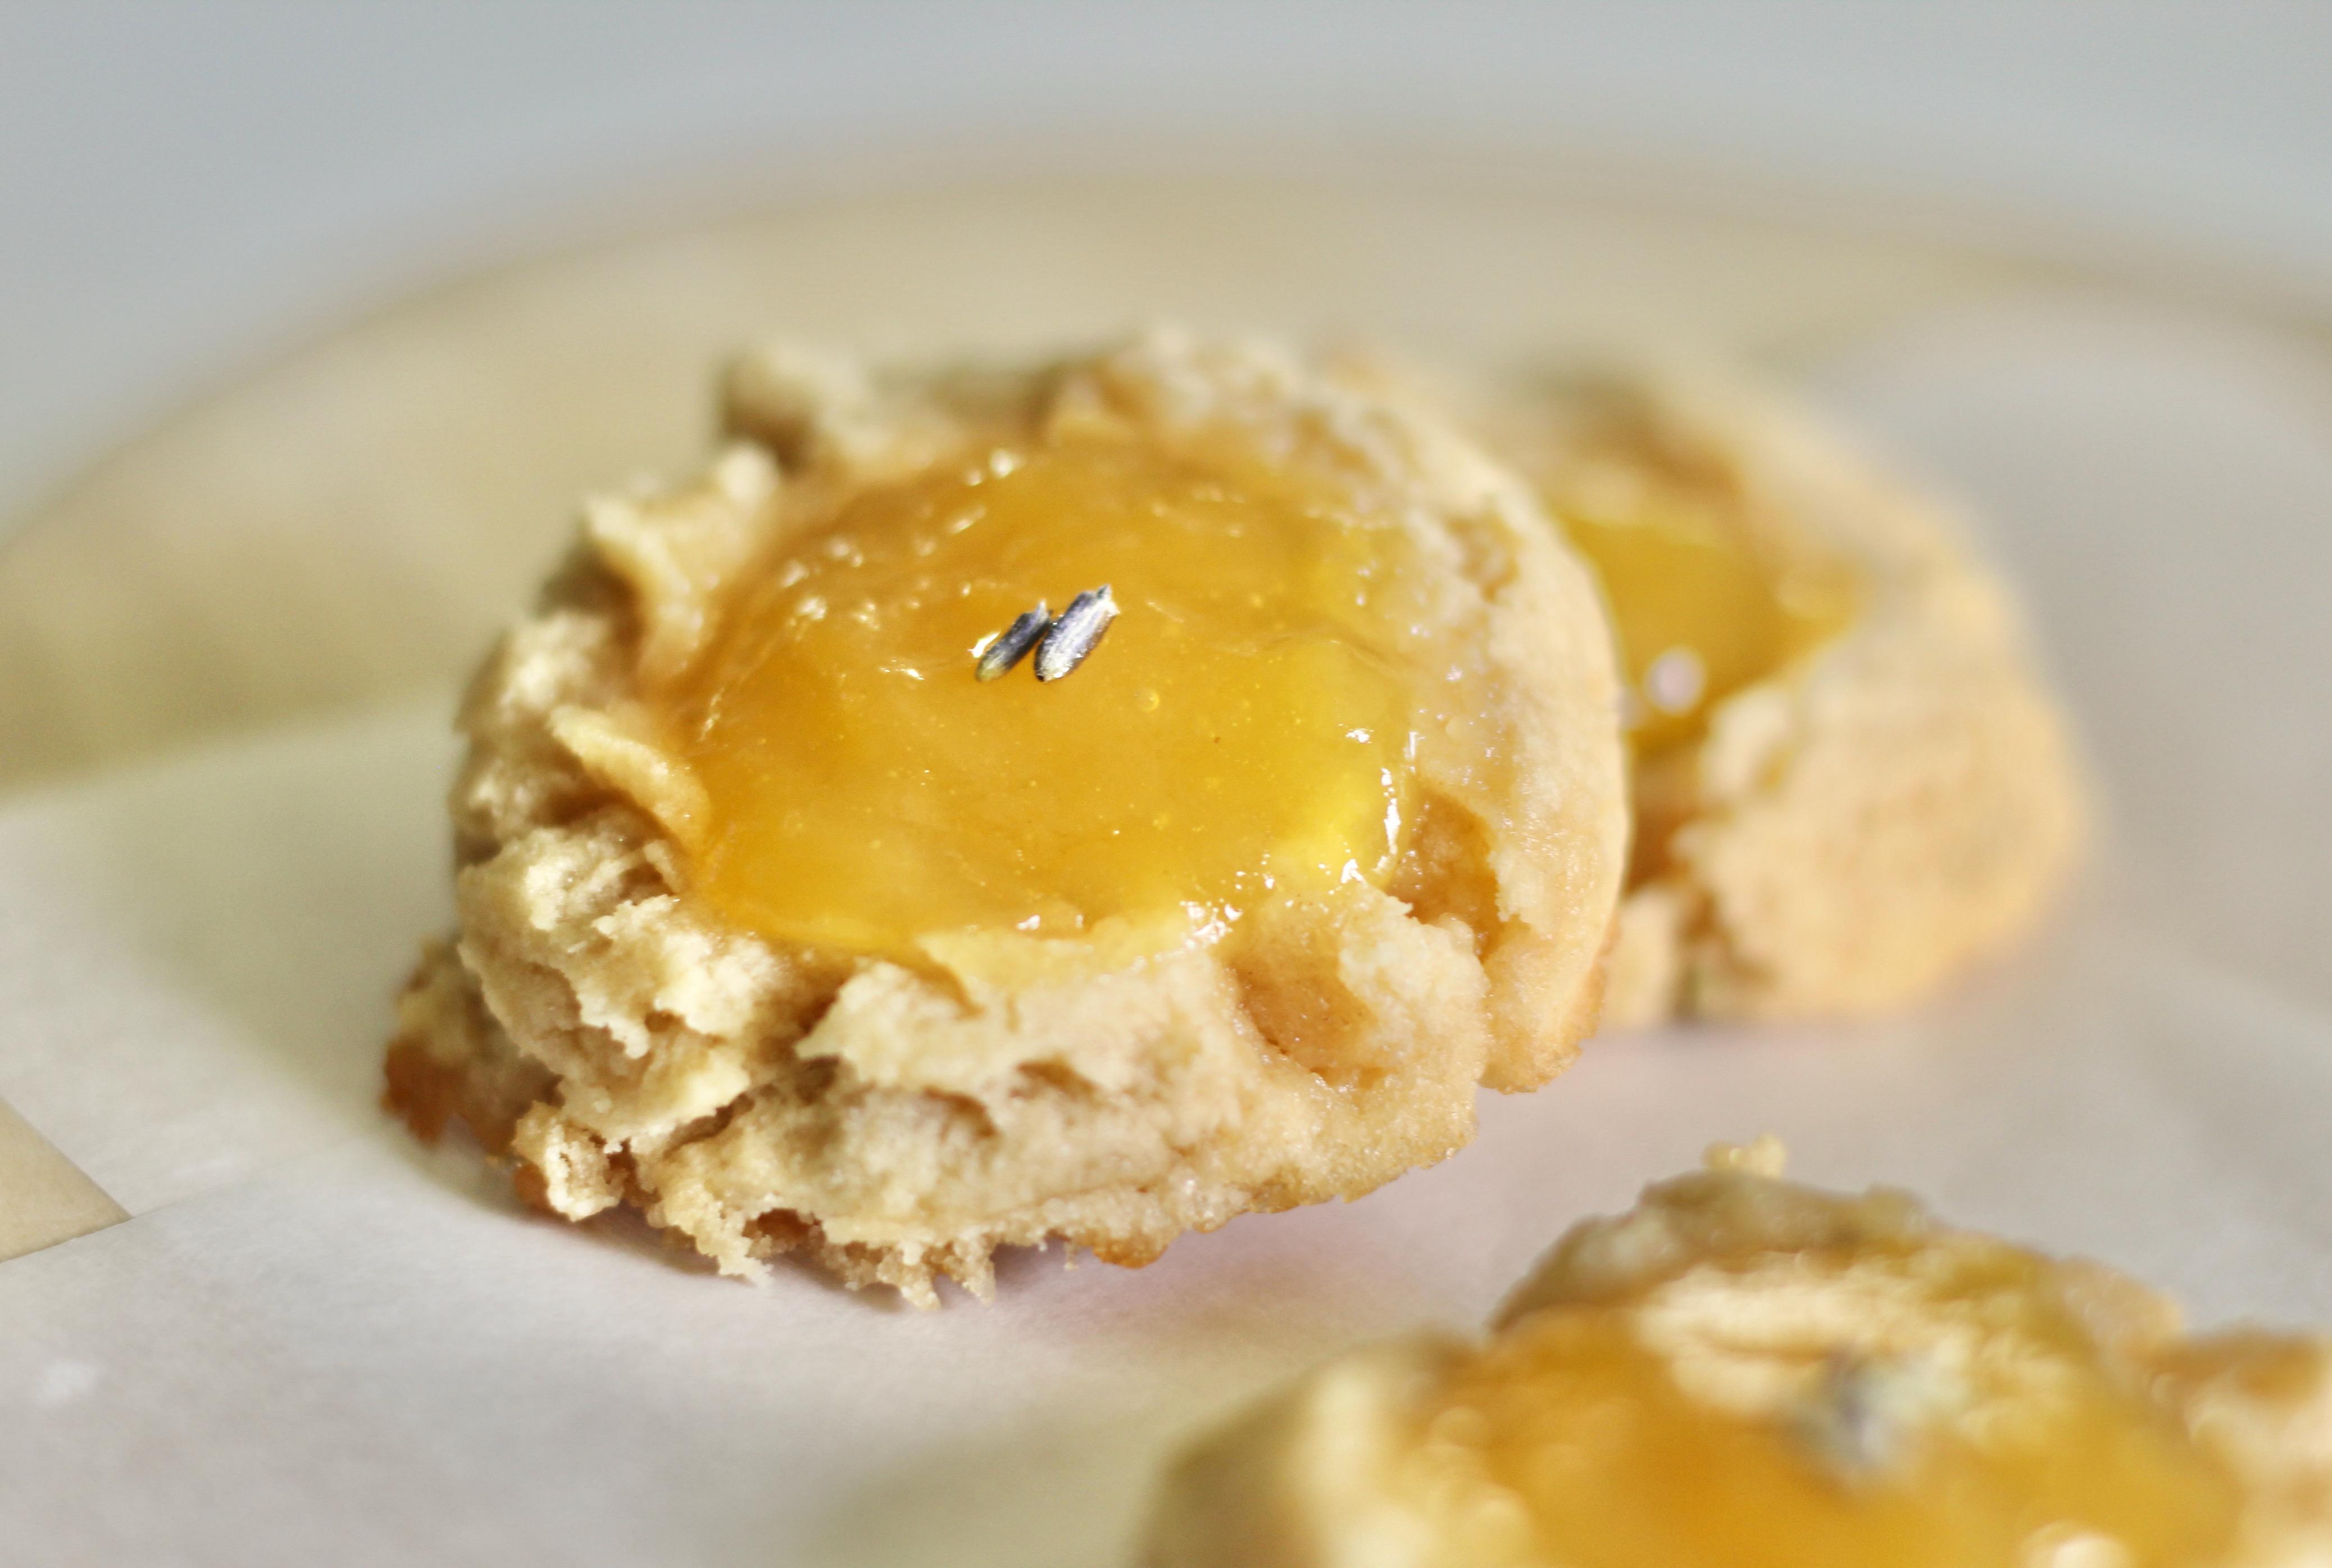 Lavender-Lemon Curd Thumbprint Cookies